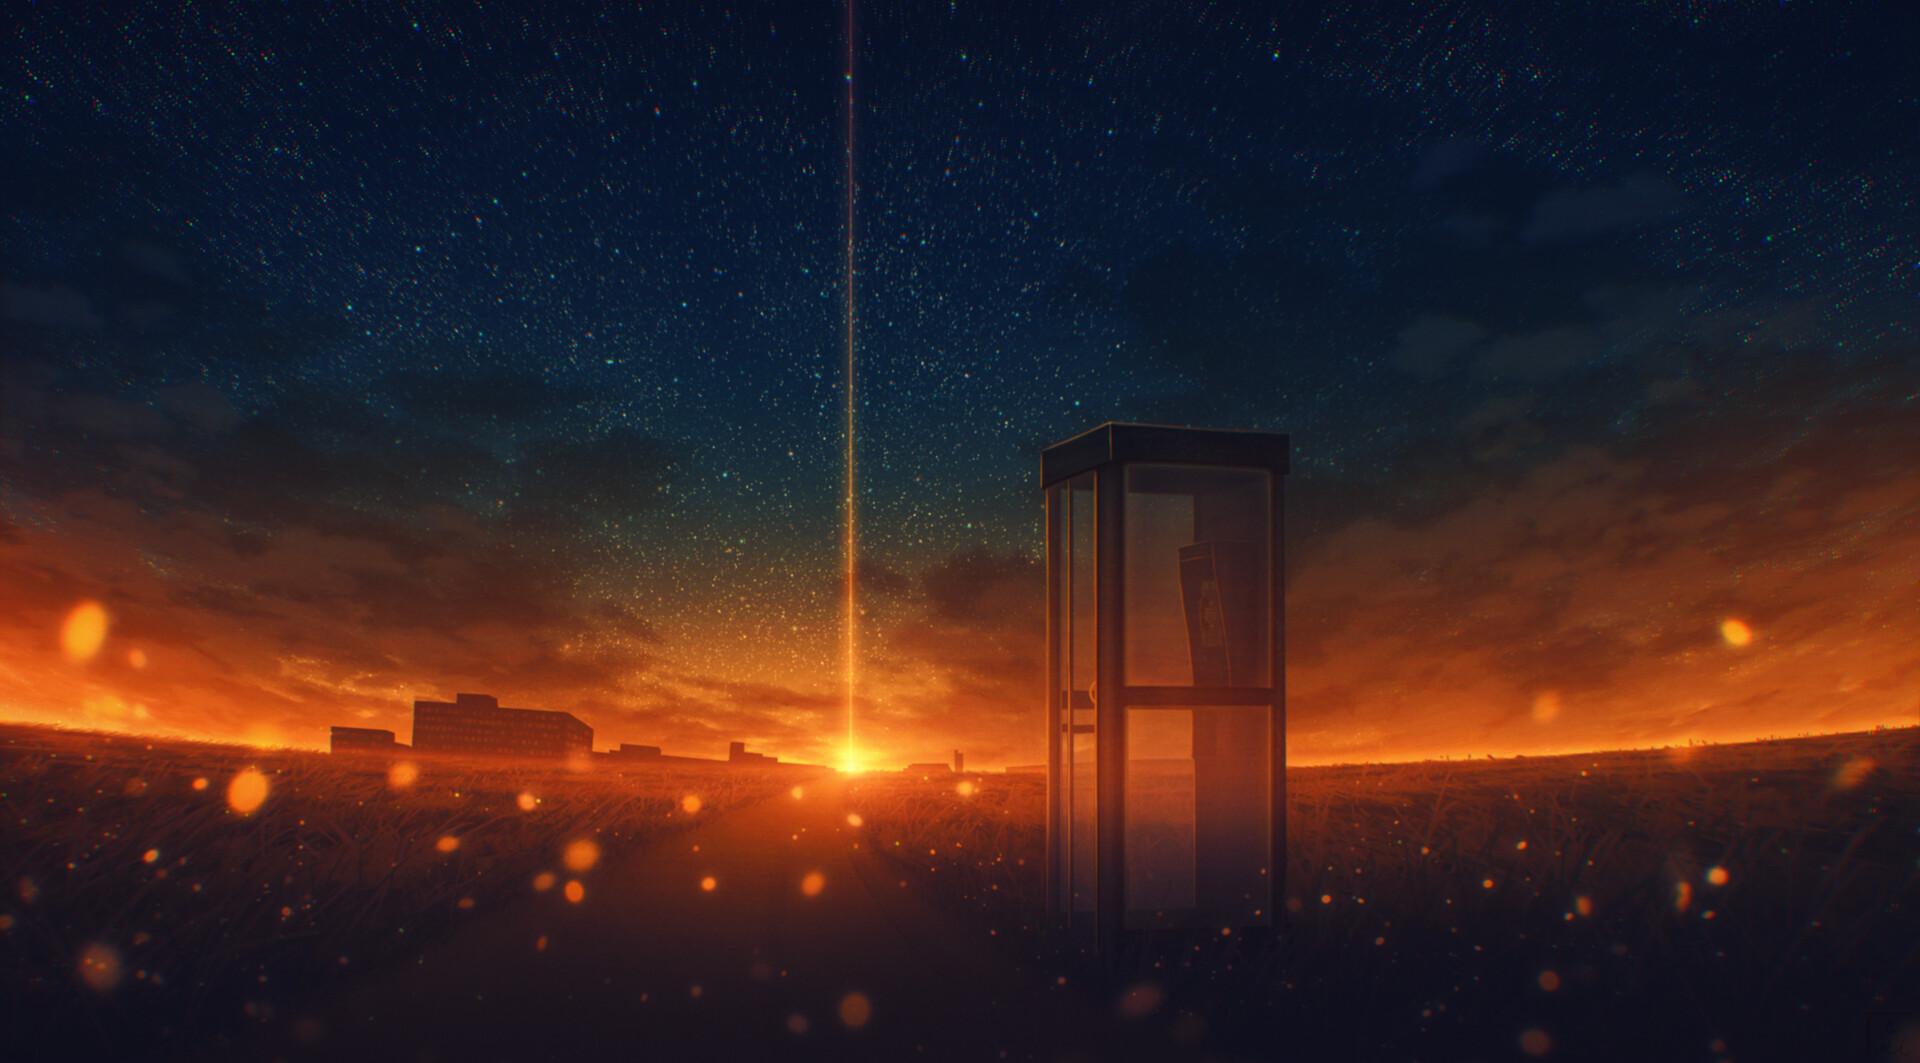 Elizabeth Miloecute Digital Art Starry Night Sunrise Sunset Phone Box Road Cityscape 1920x1063